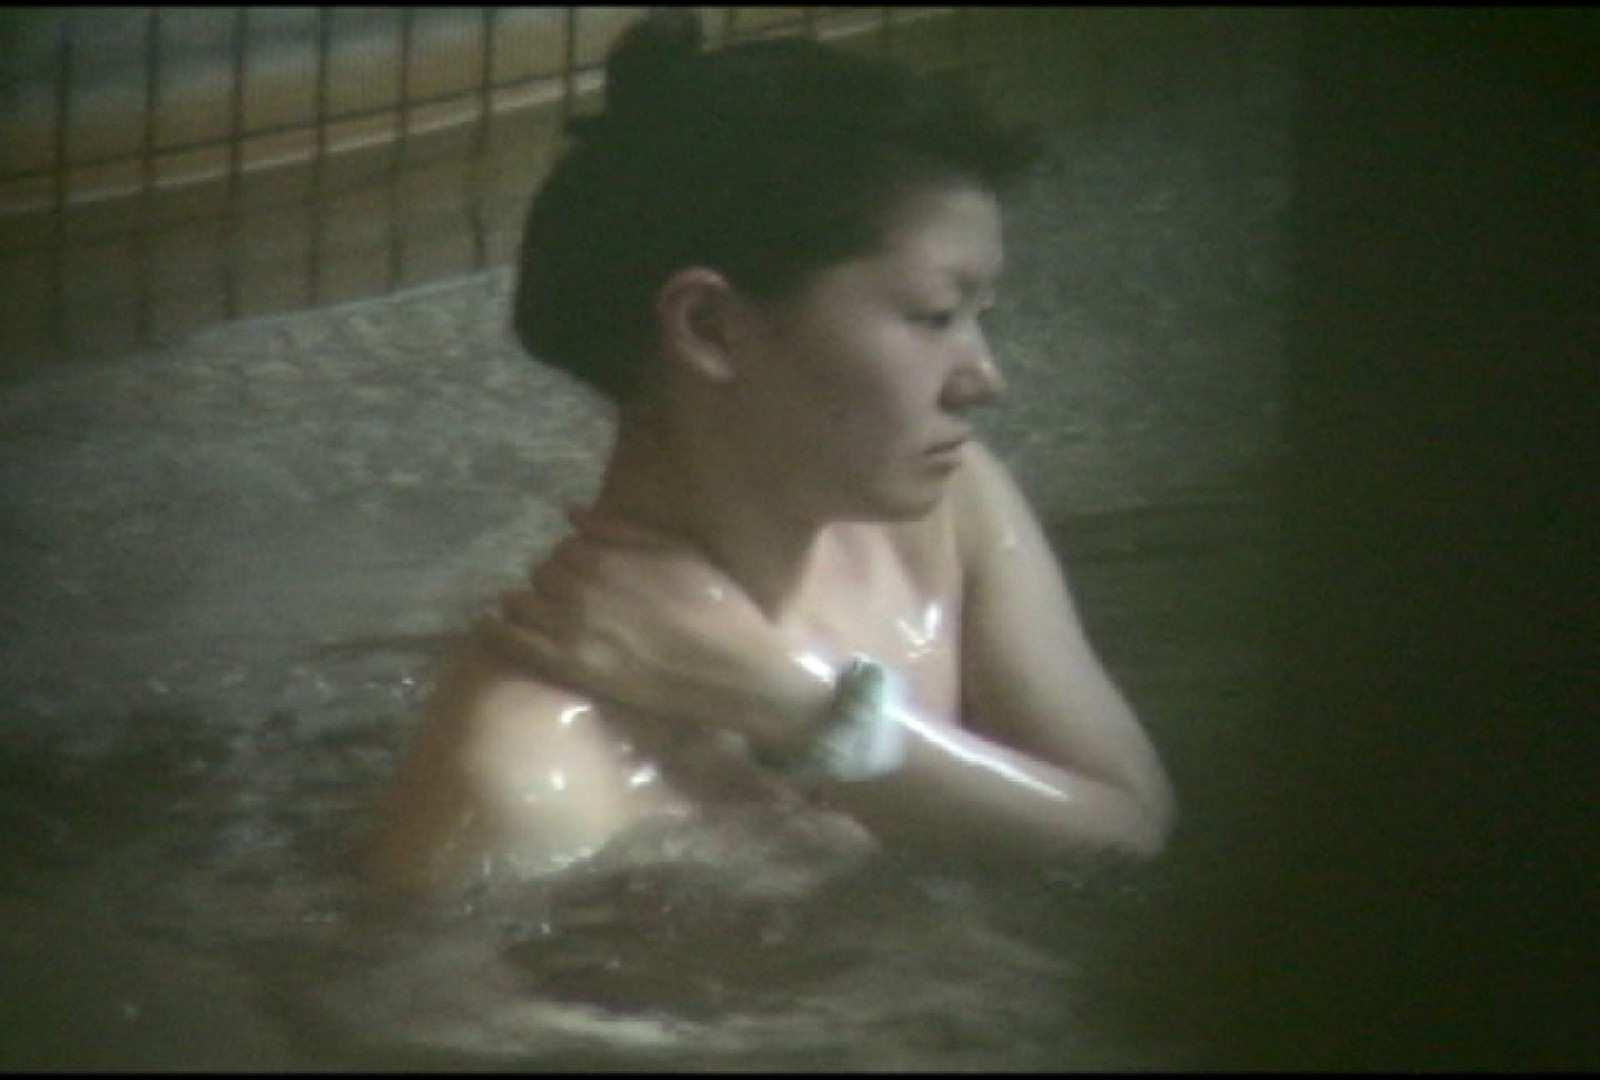 Aquaな露天風呂Vol.699 OL女体 えろ無修正画像 60連発 23